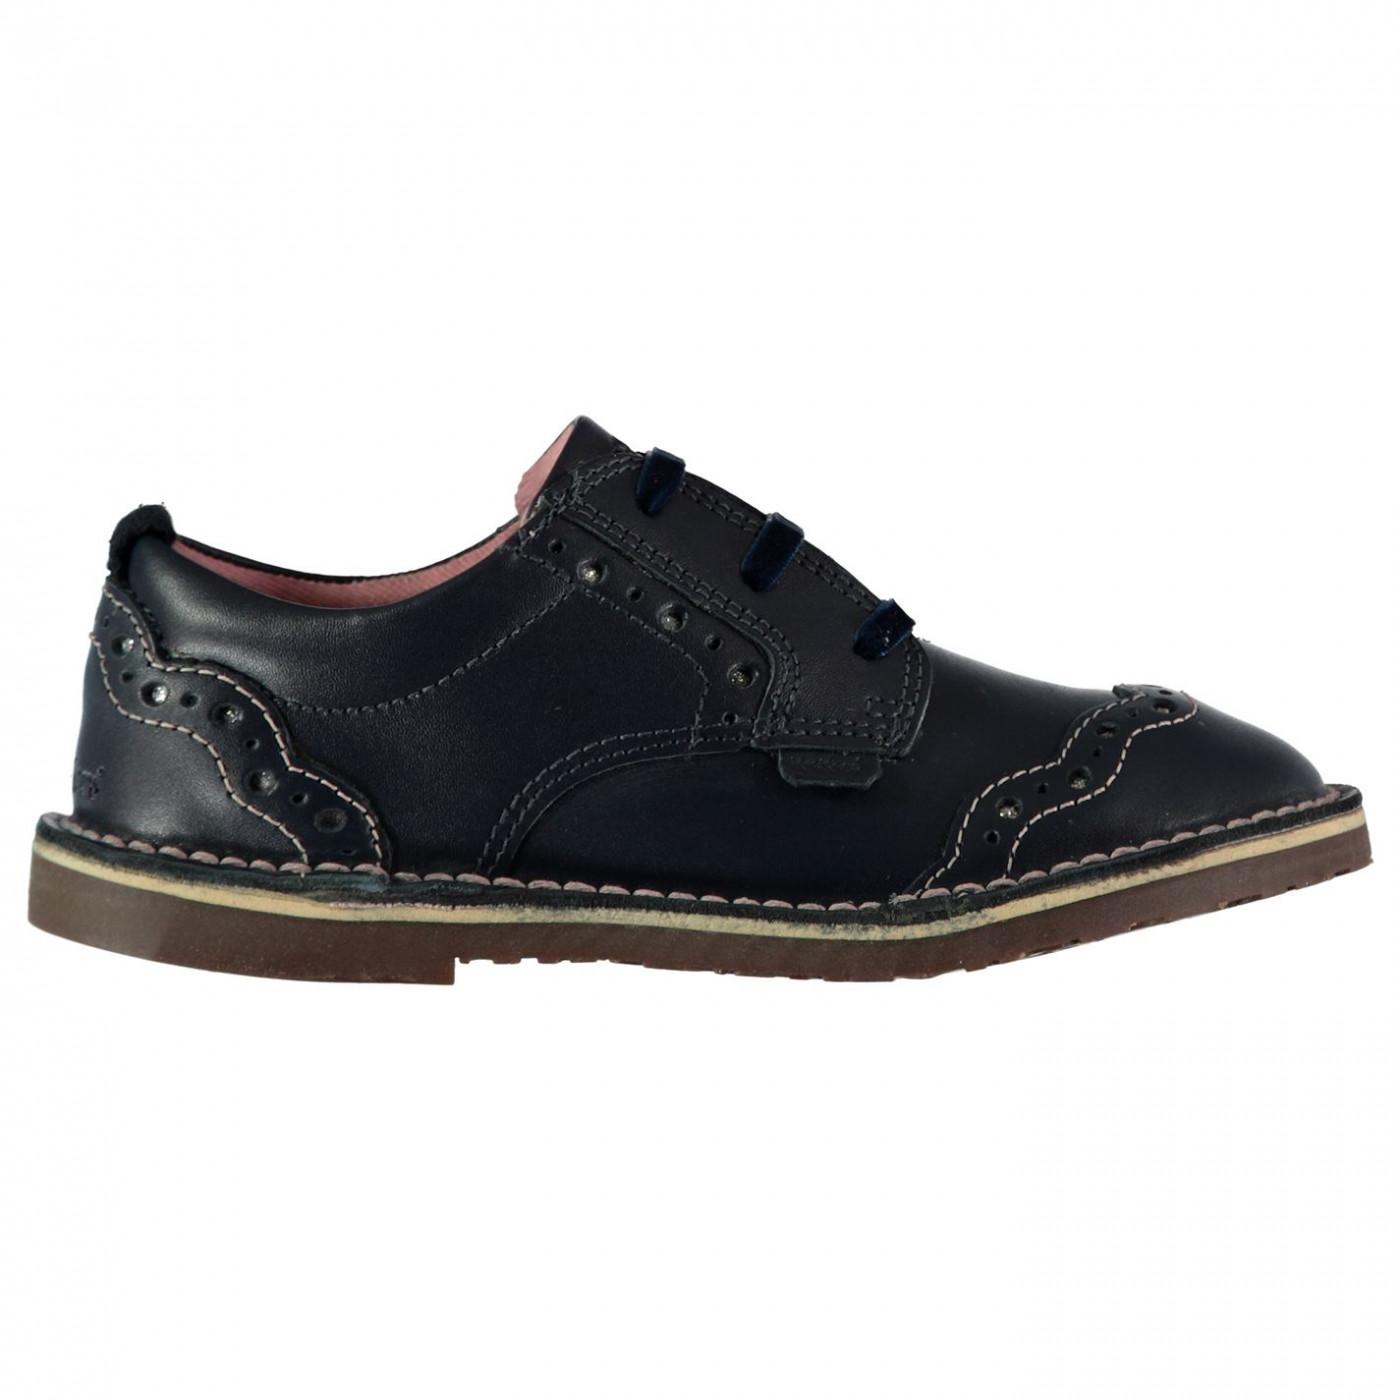 Kickers Adlar Girls Shoes